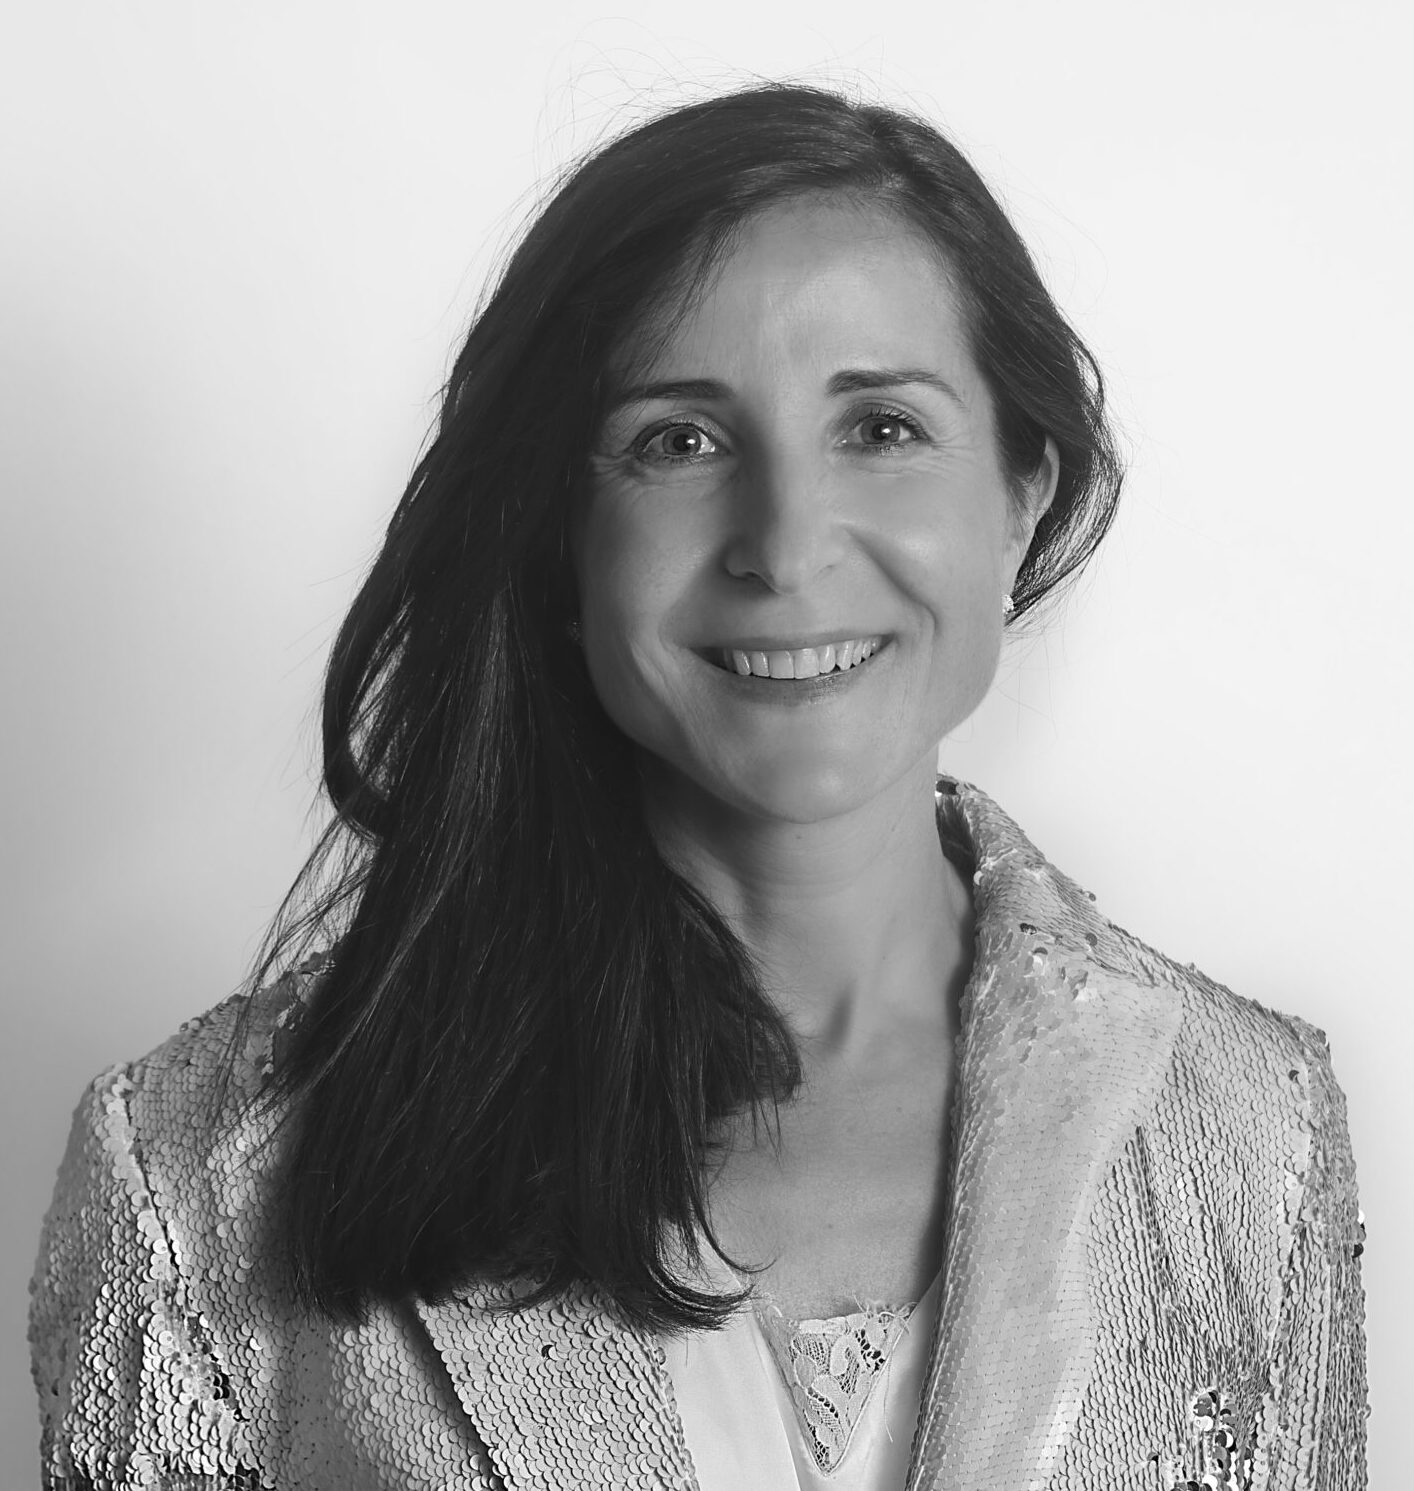 Alejandra Cortés